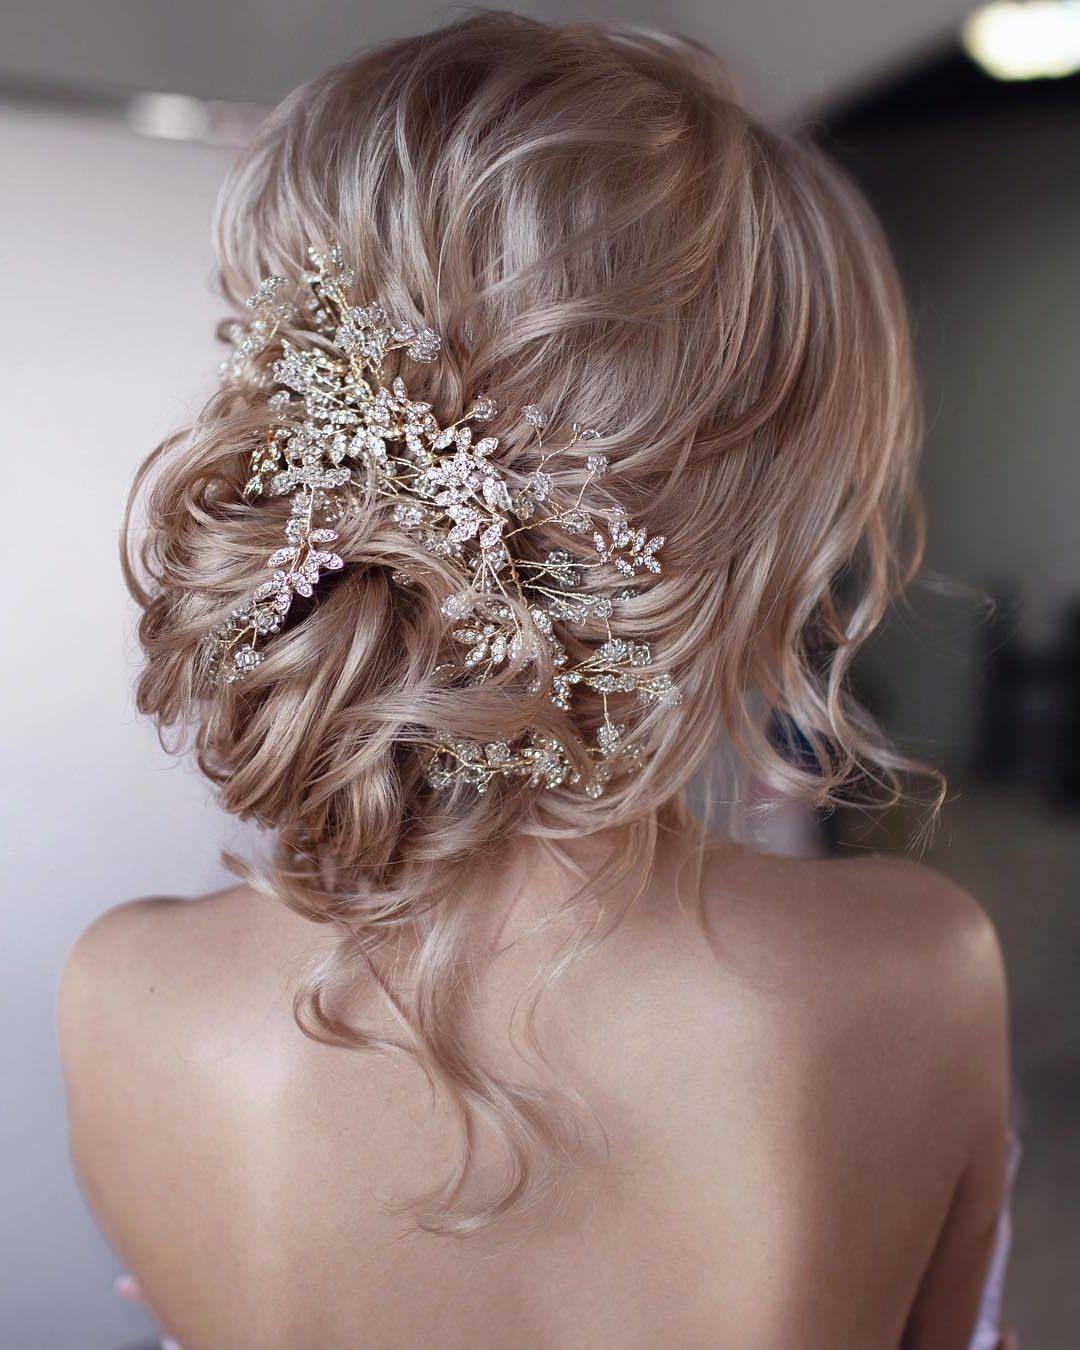 20 casual updos for long hair tutorials | updos | wedding